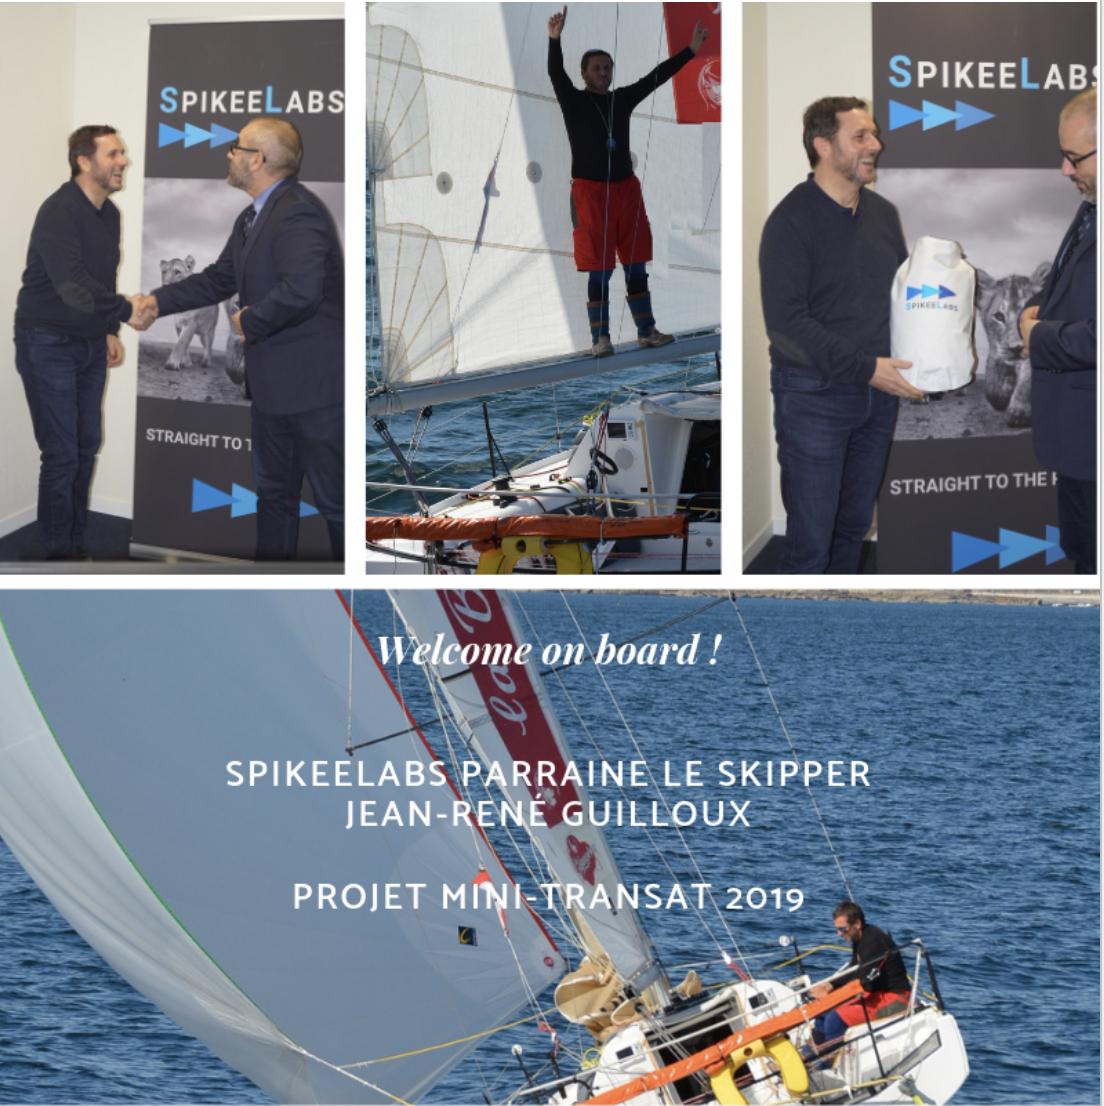 Spikeelabs Rentre Dans L'aventure Minimir Sailing Team